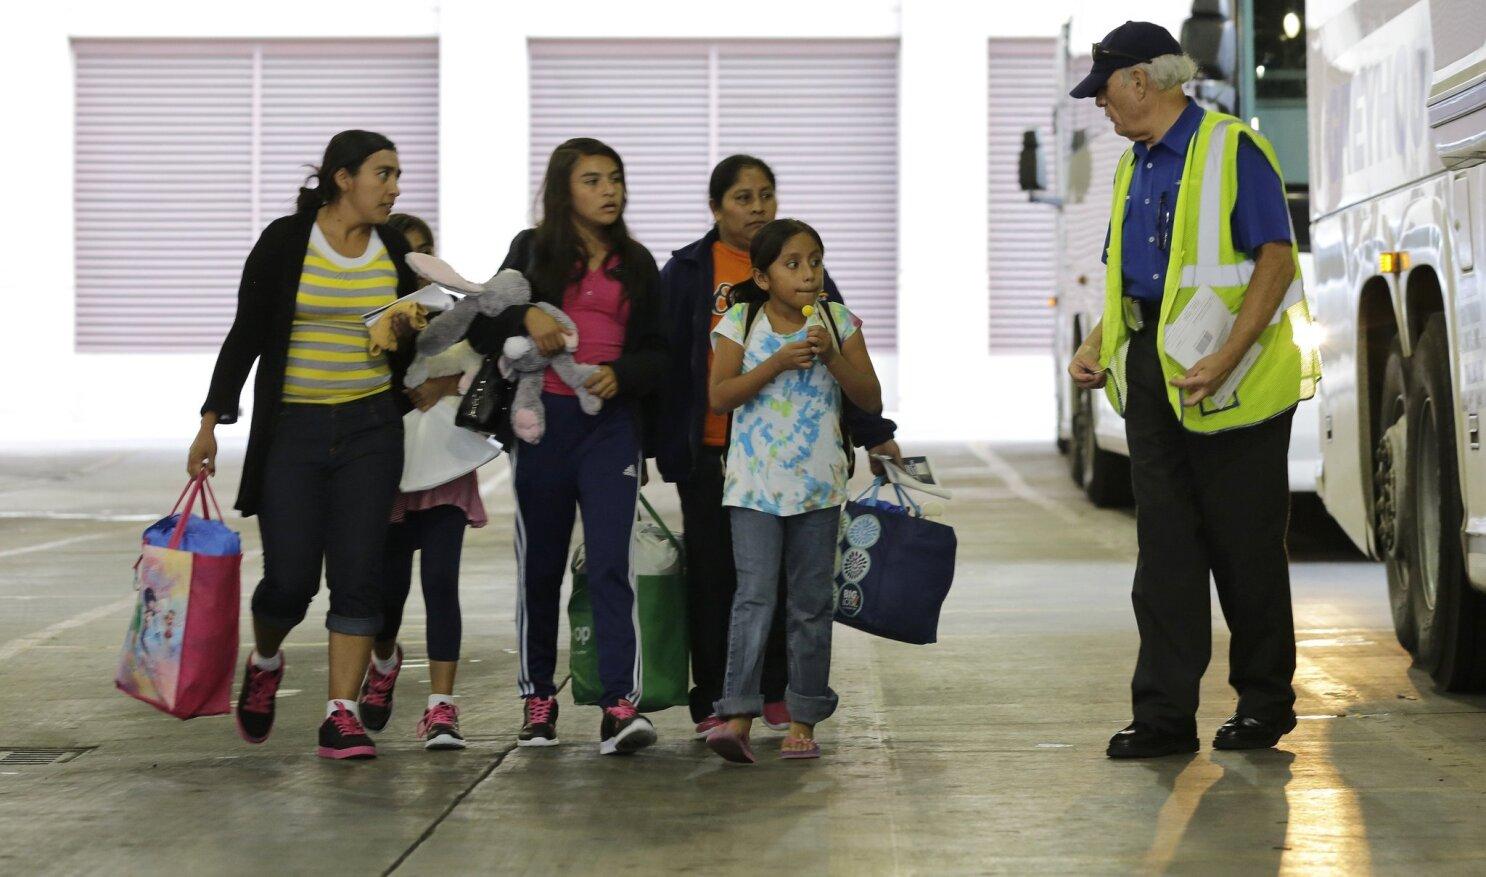 Editorial: Trump's new plan to incarcerate migrant families isn't just cruel, it's unjustifiable